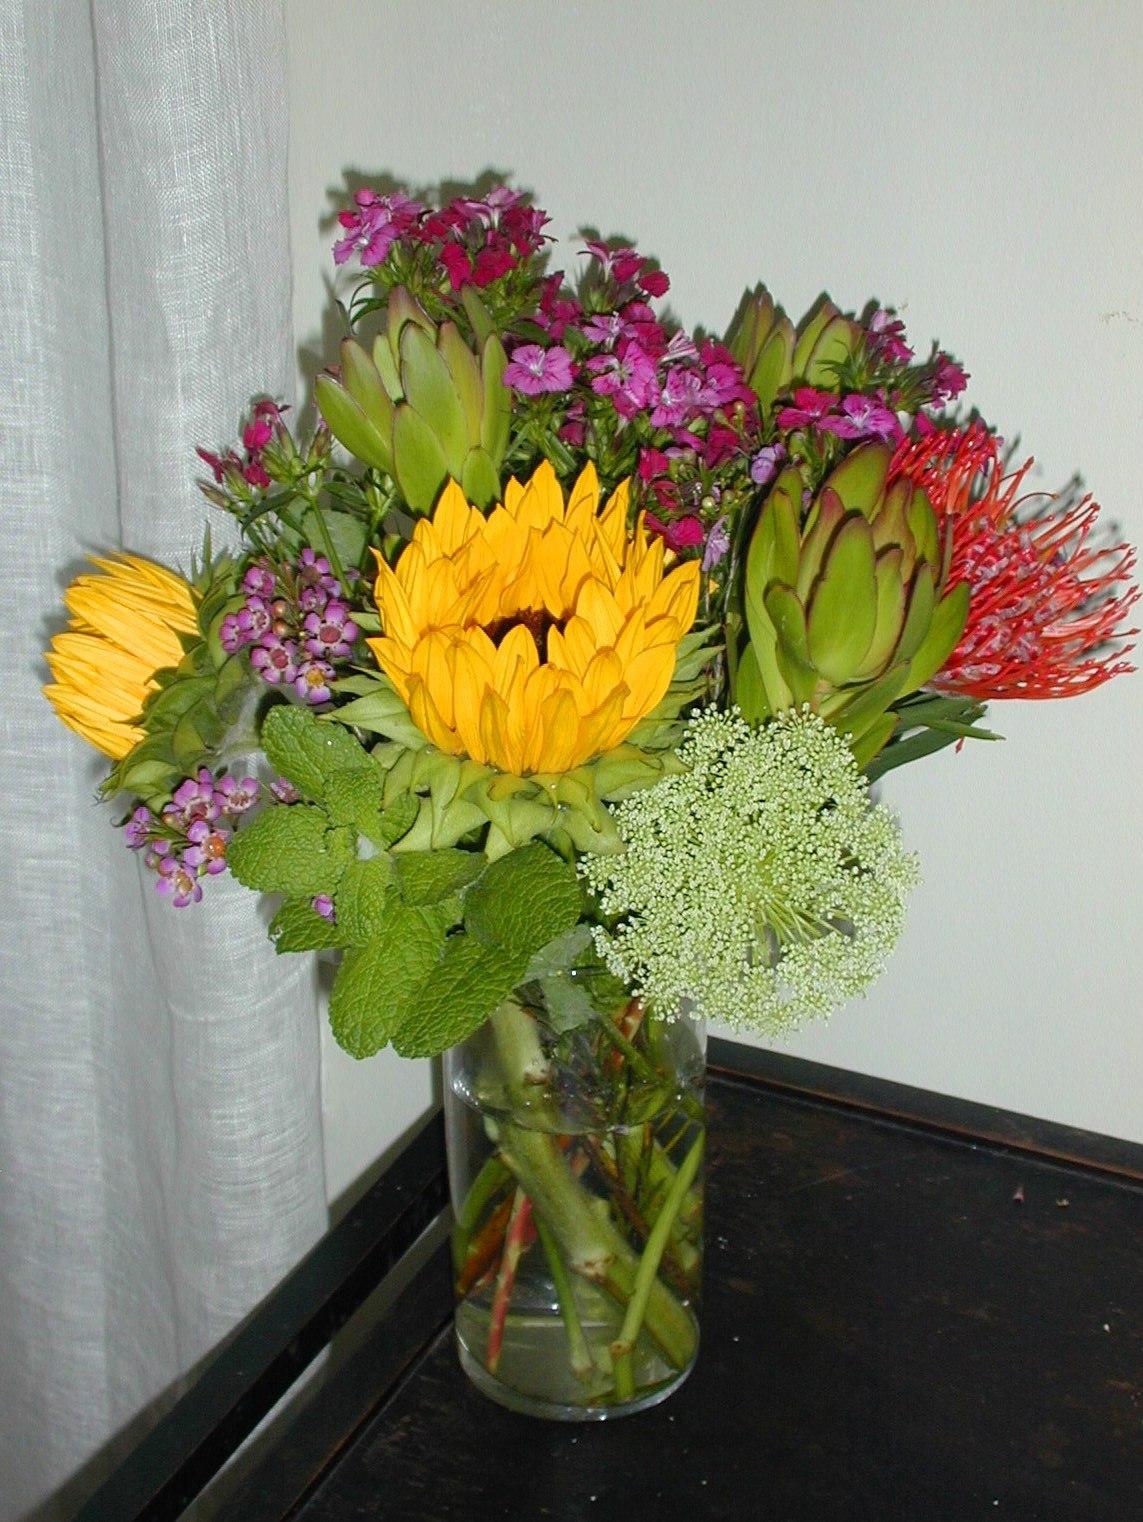 Comment Conserver Du Muguet En Vase keen & fitting